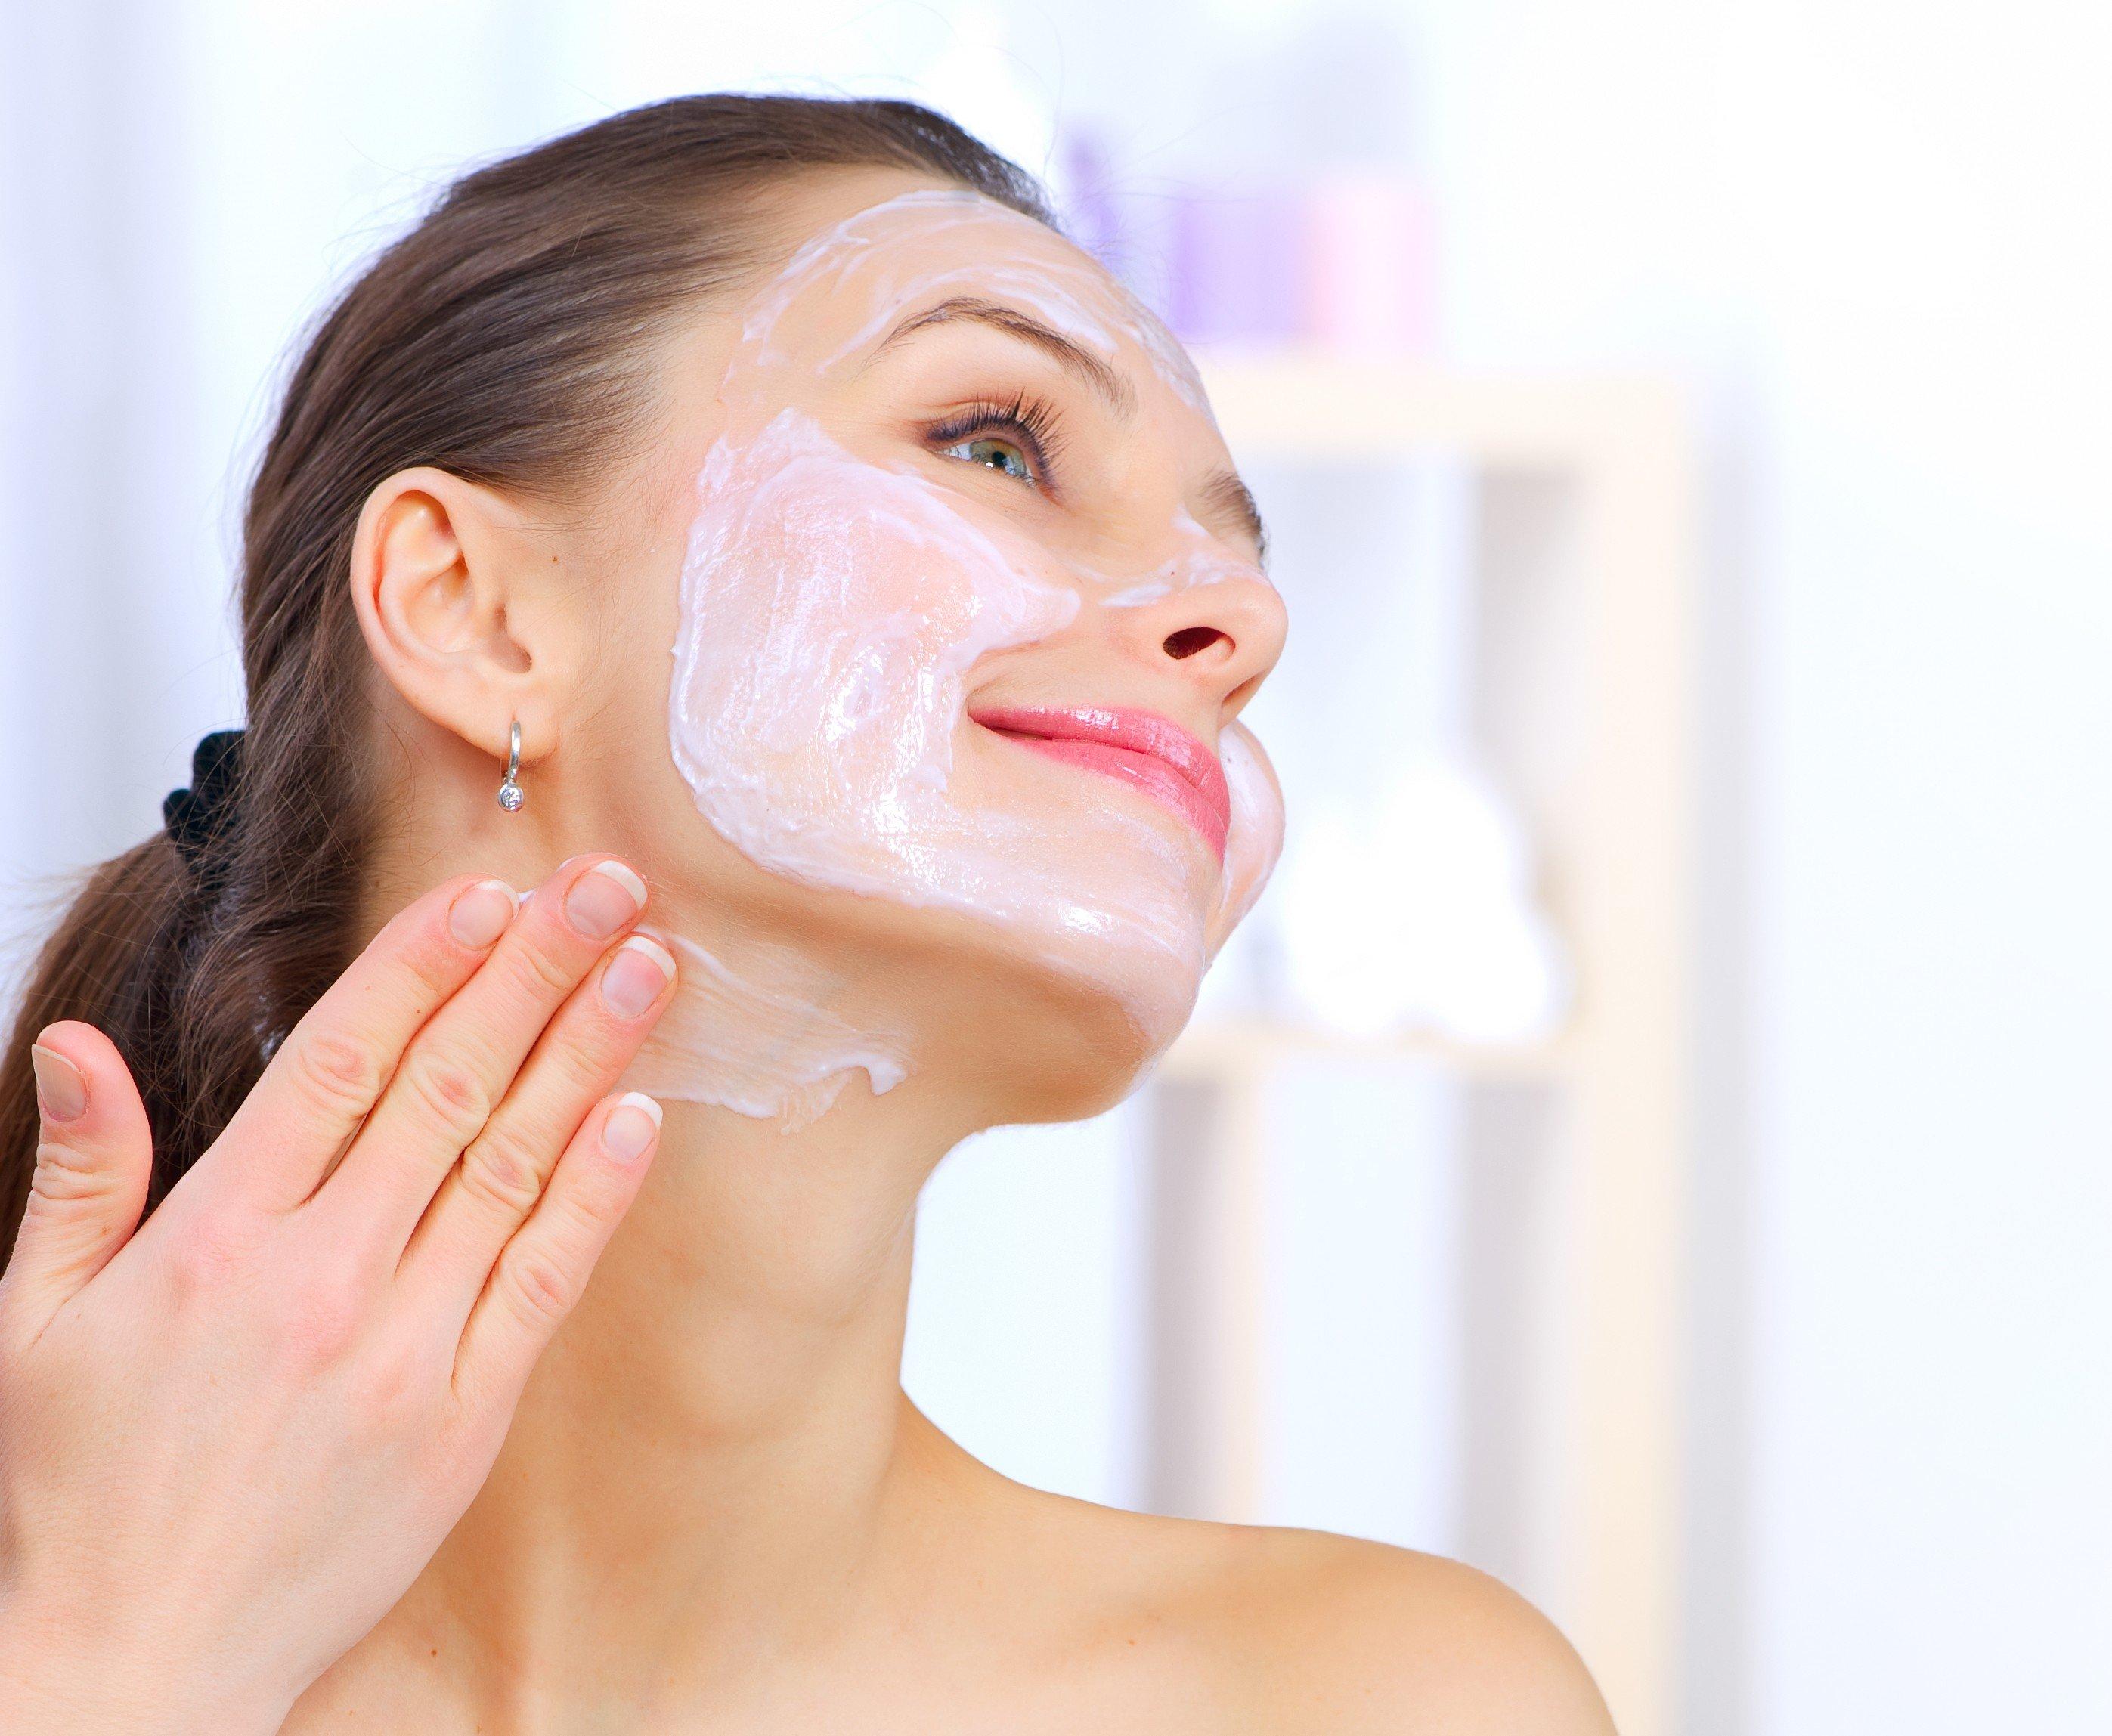 Очищаюча маска для обличчя в домашніх умовах